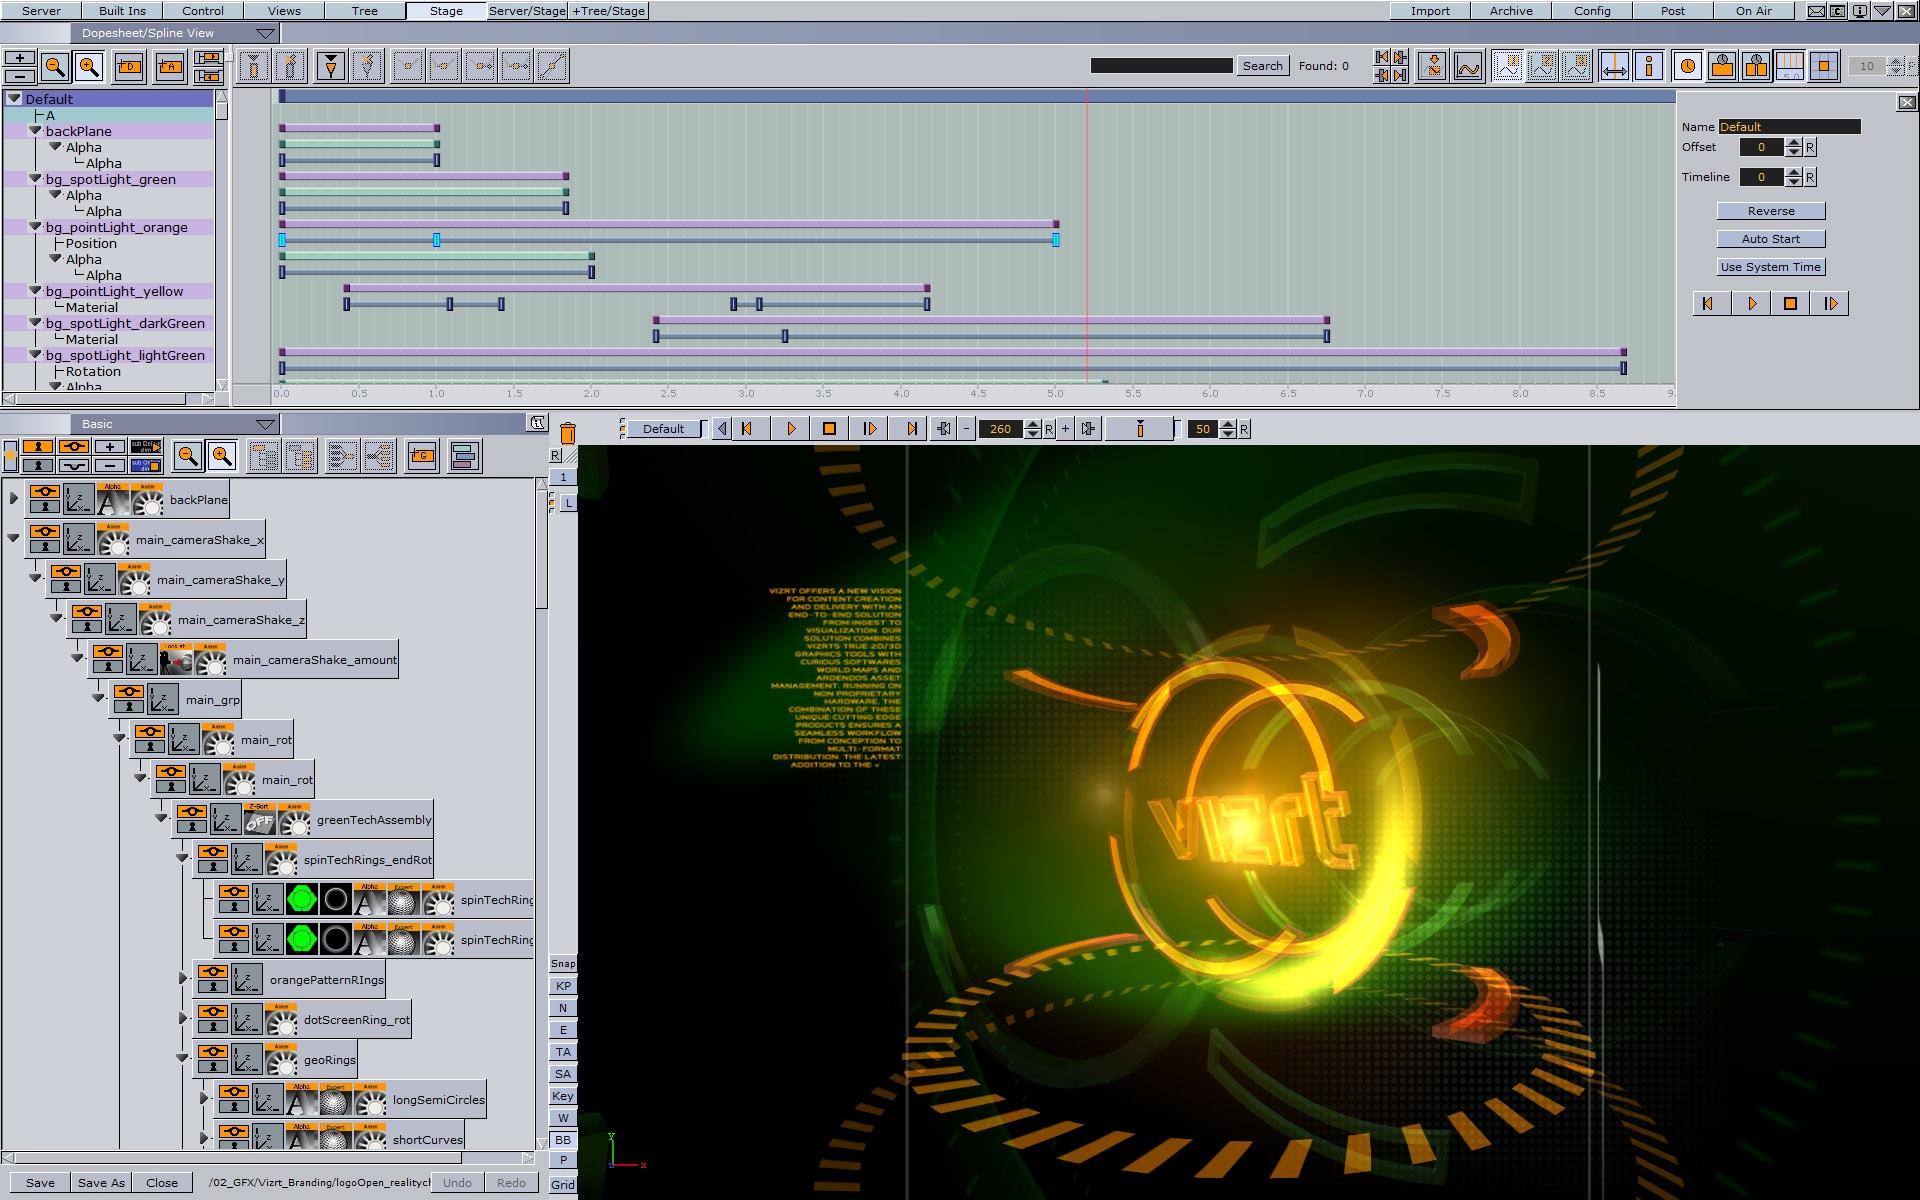 Vizrt Introduces Viz Engine/Artist 3 3 at IBC 2010 | Pipeline